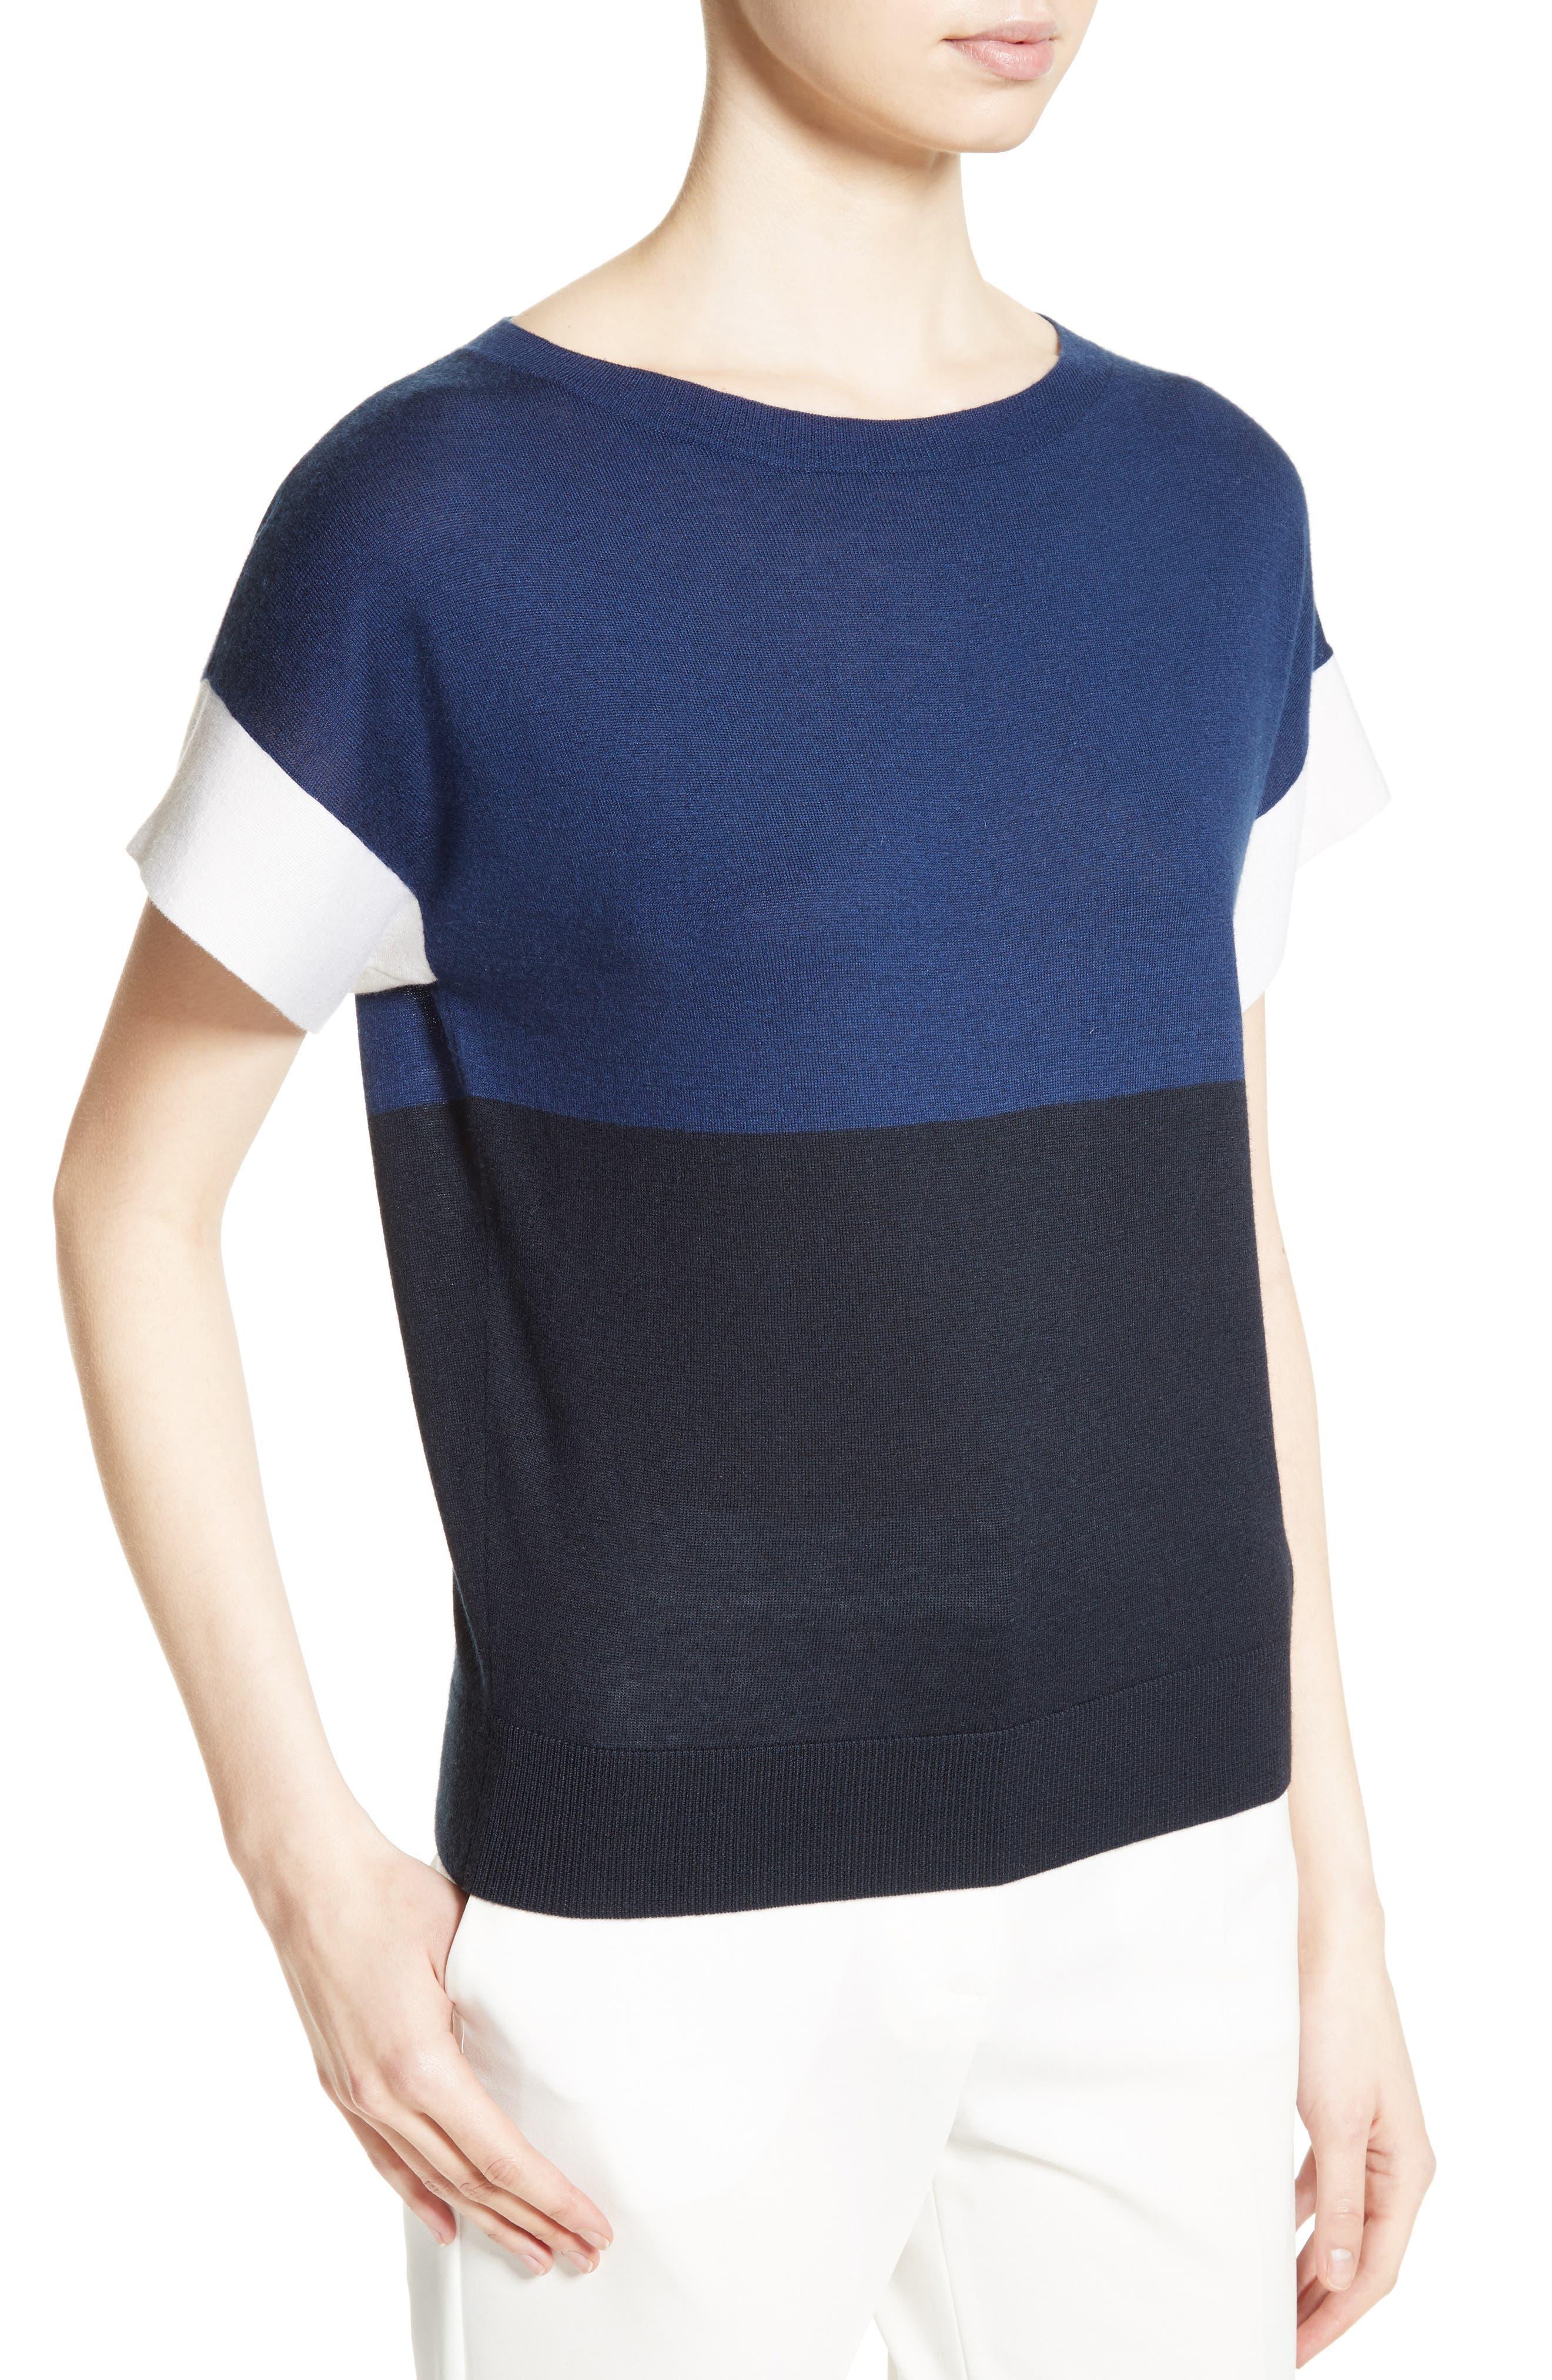 Colimbo Silk & Cashmere Top,                             Alternate thumbnail 5, color,                             Ultra Marine